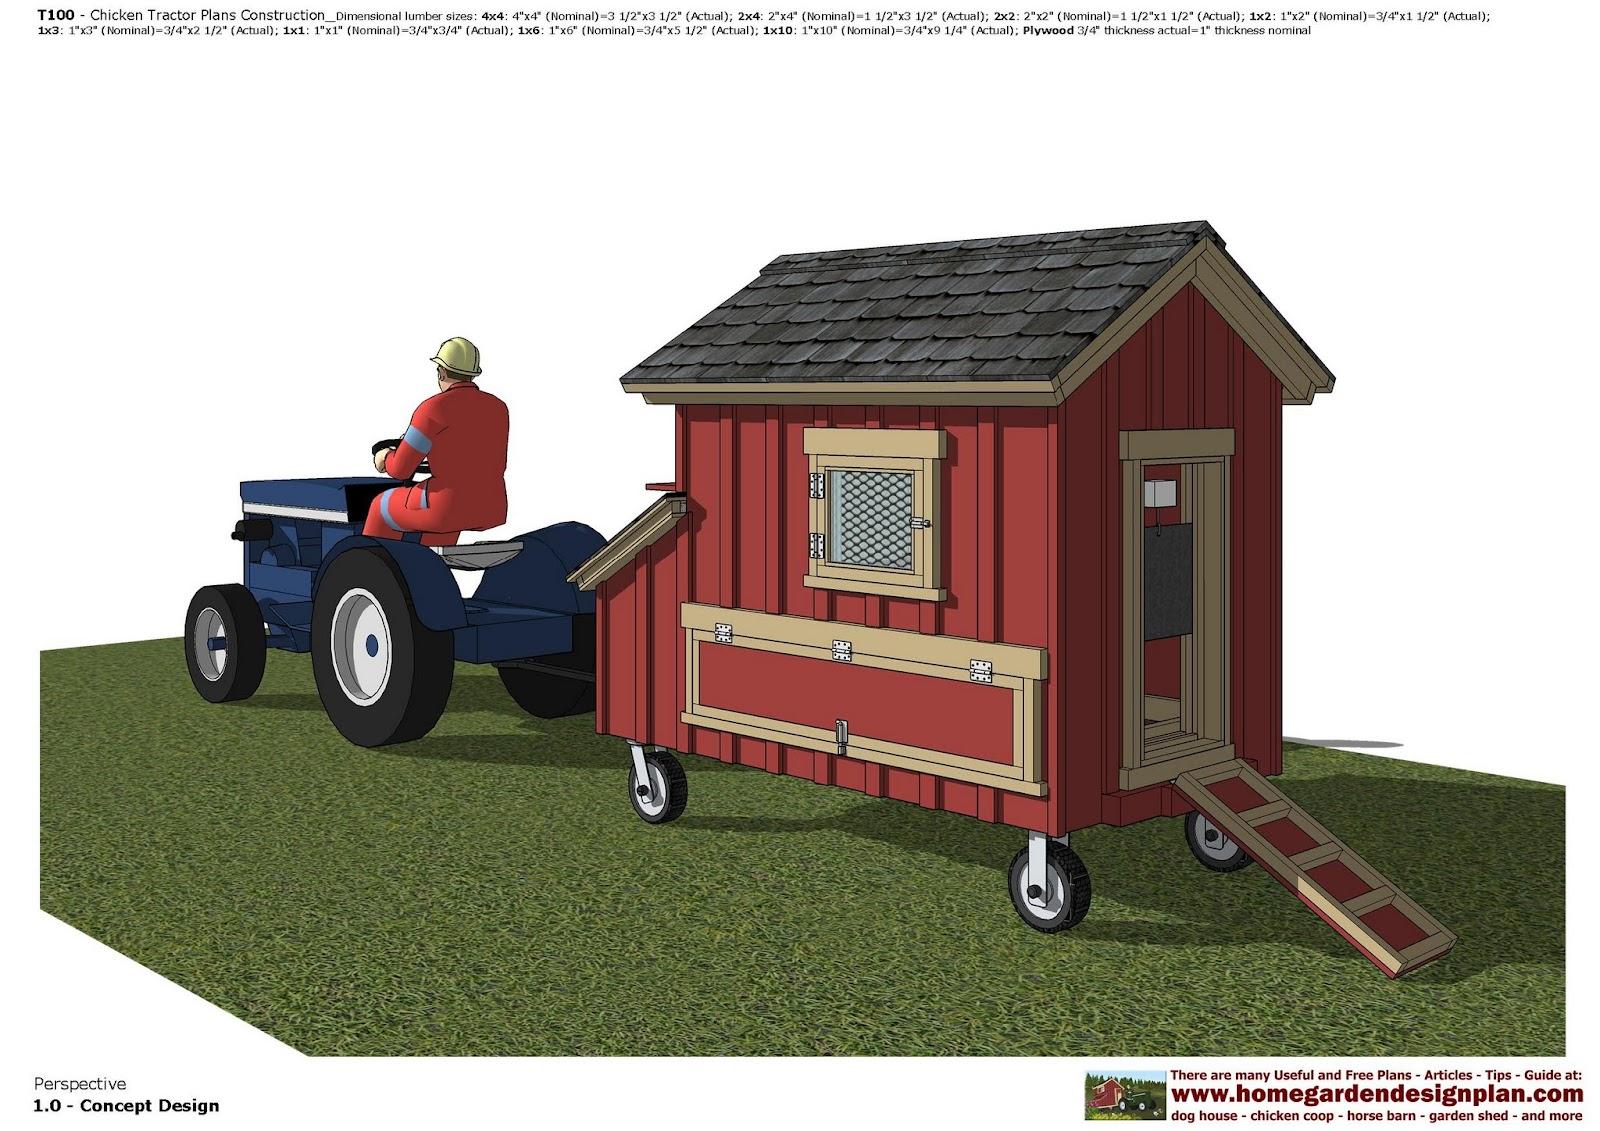 T100 Chicken Tractor Plans Chicken Trailer Plans Construction – Garden Tractor Trailer Plans